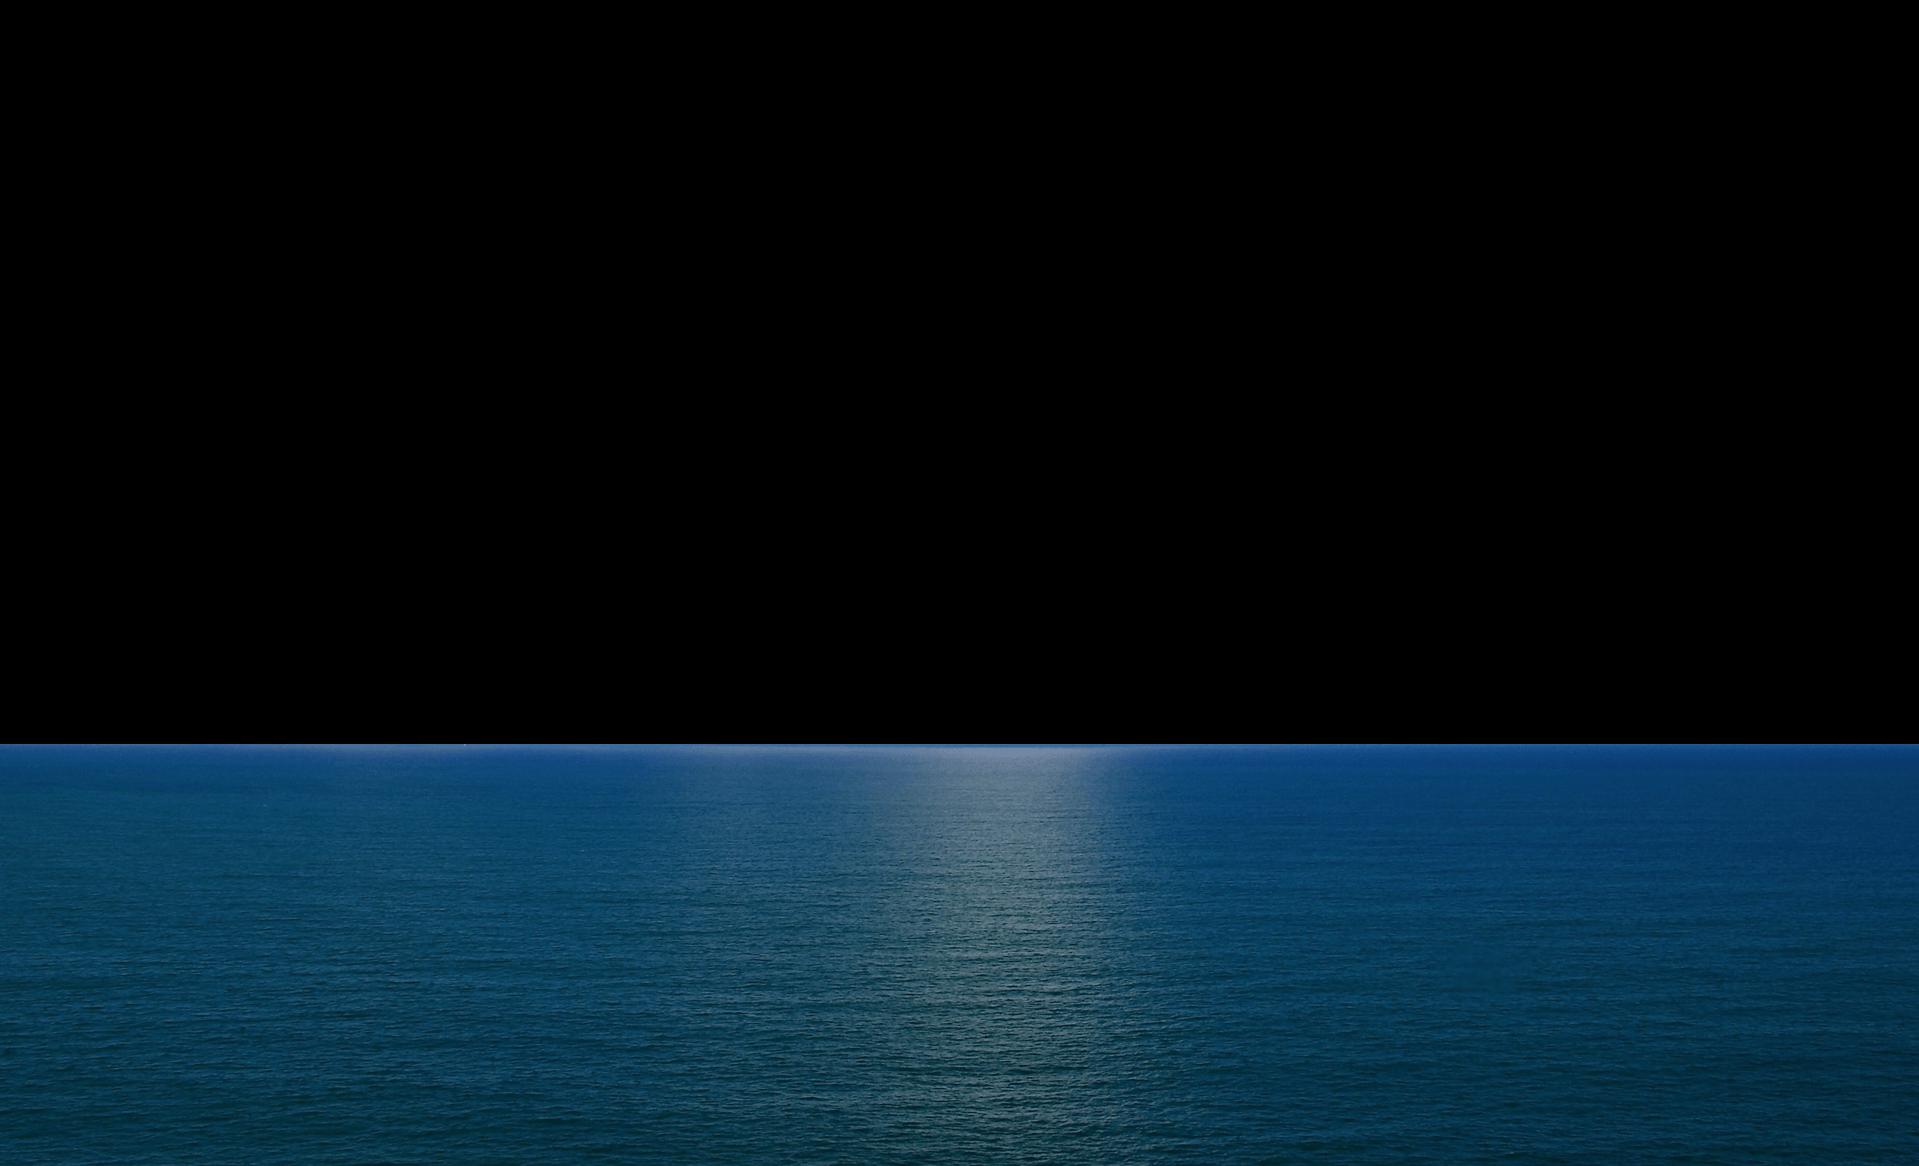 Sea png image purepng. Ocean clipart transparent background